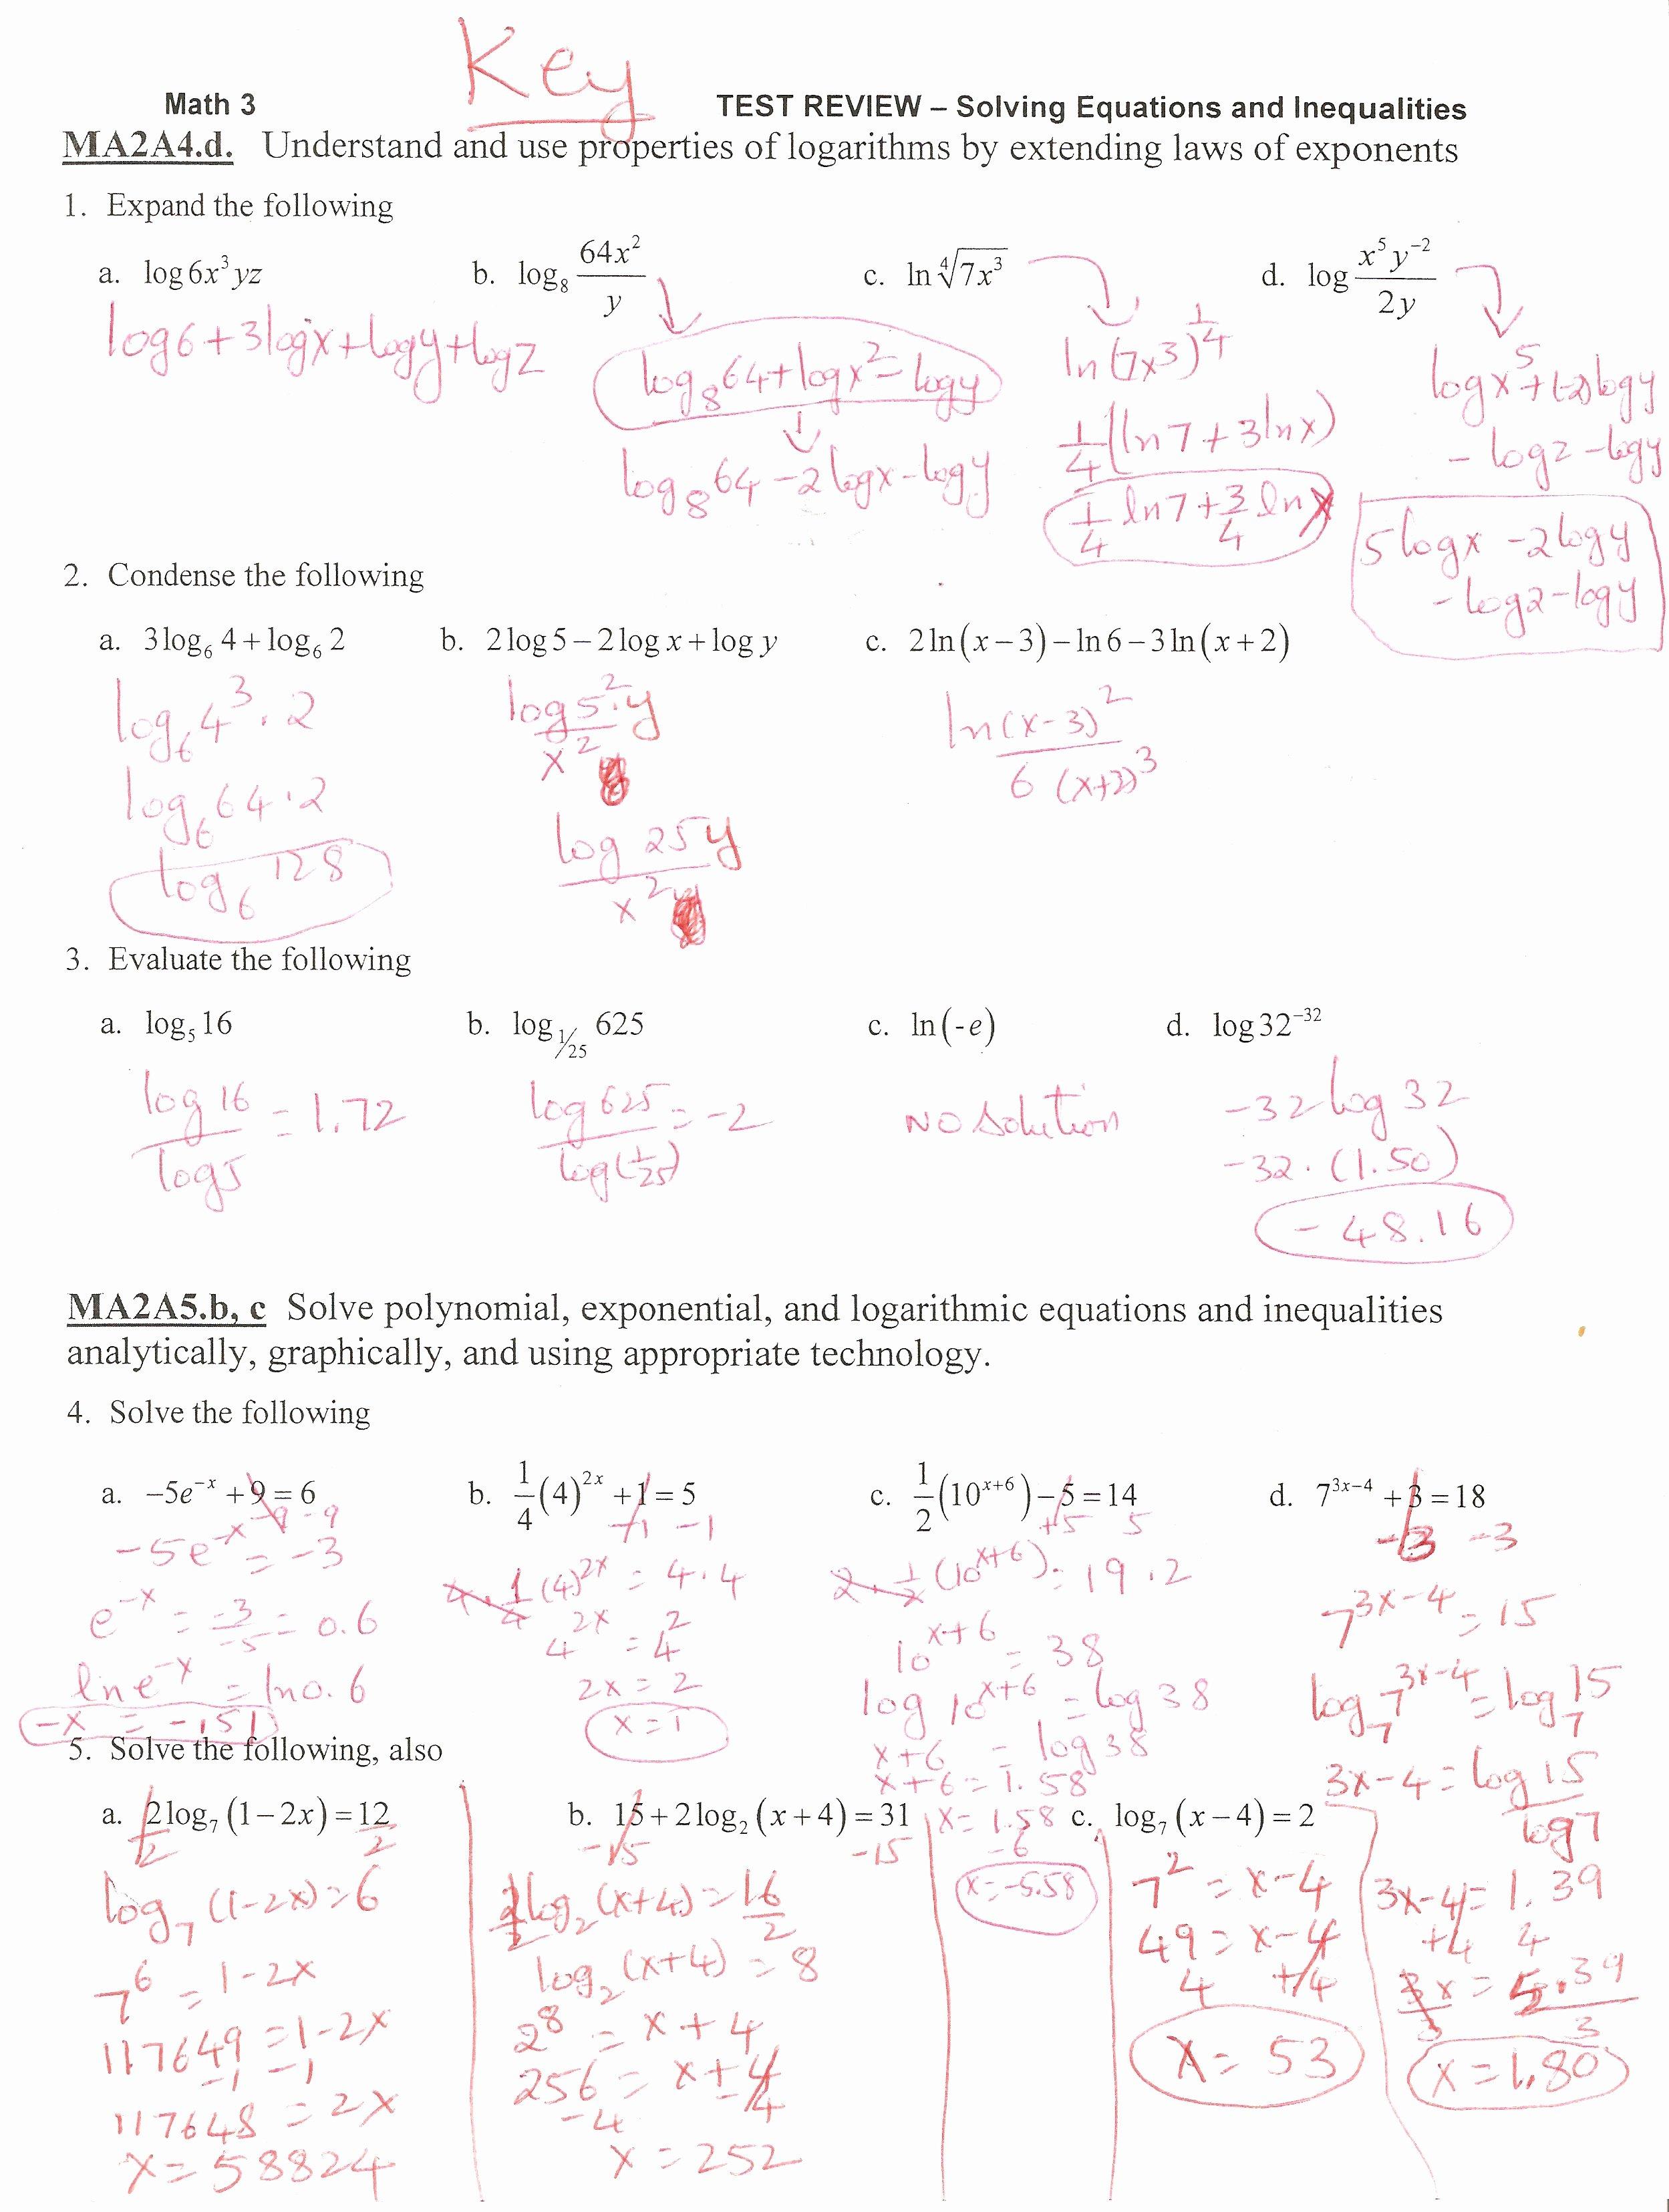 Logarithm Worksheet with Answers Elegant Expanding and Condensing Logarithms Worksheet with Answers